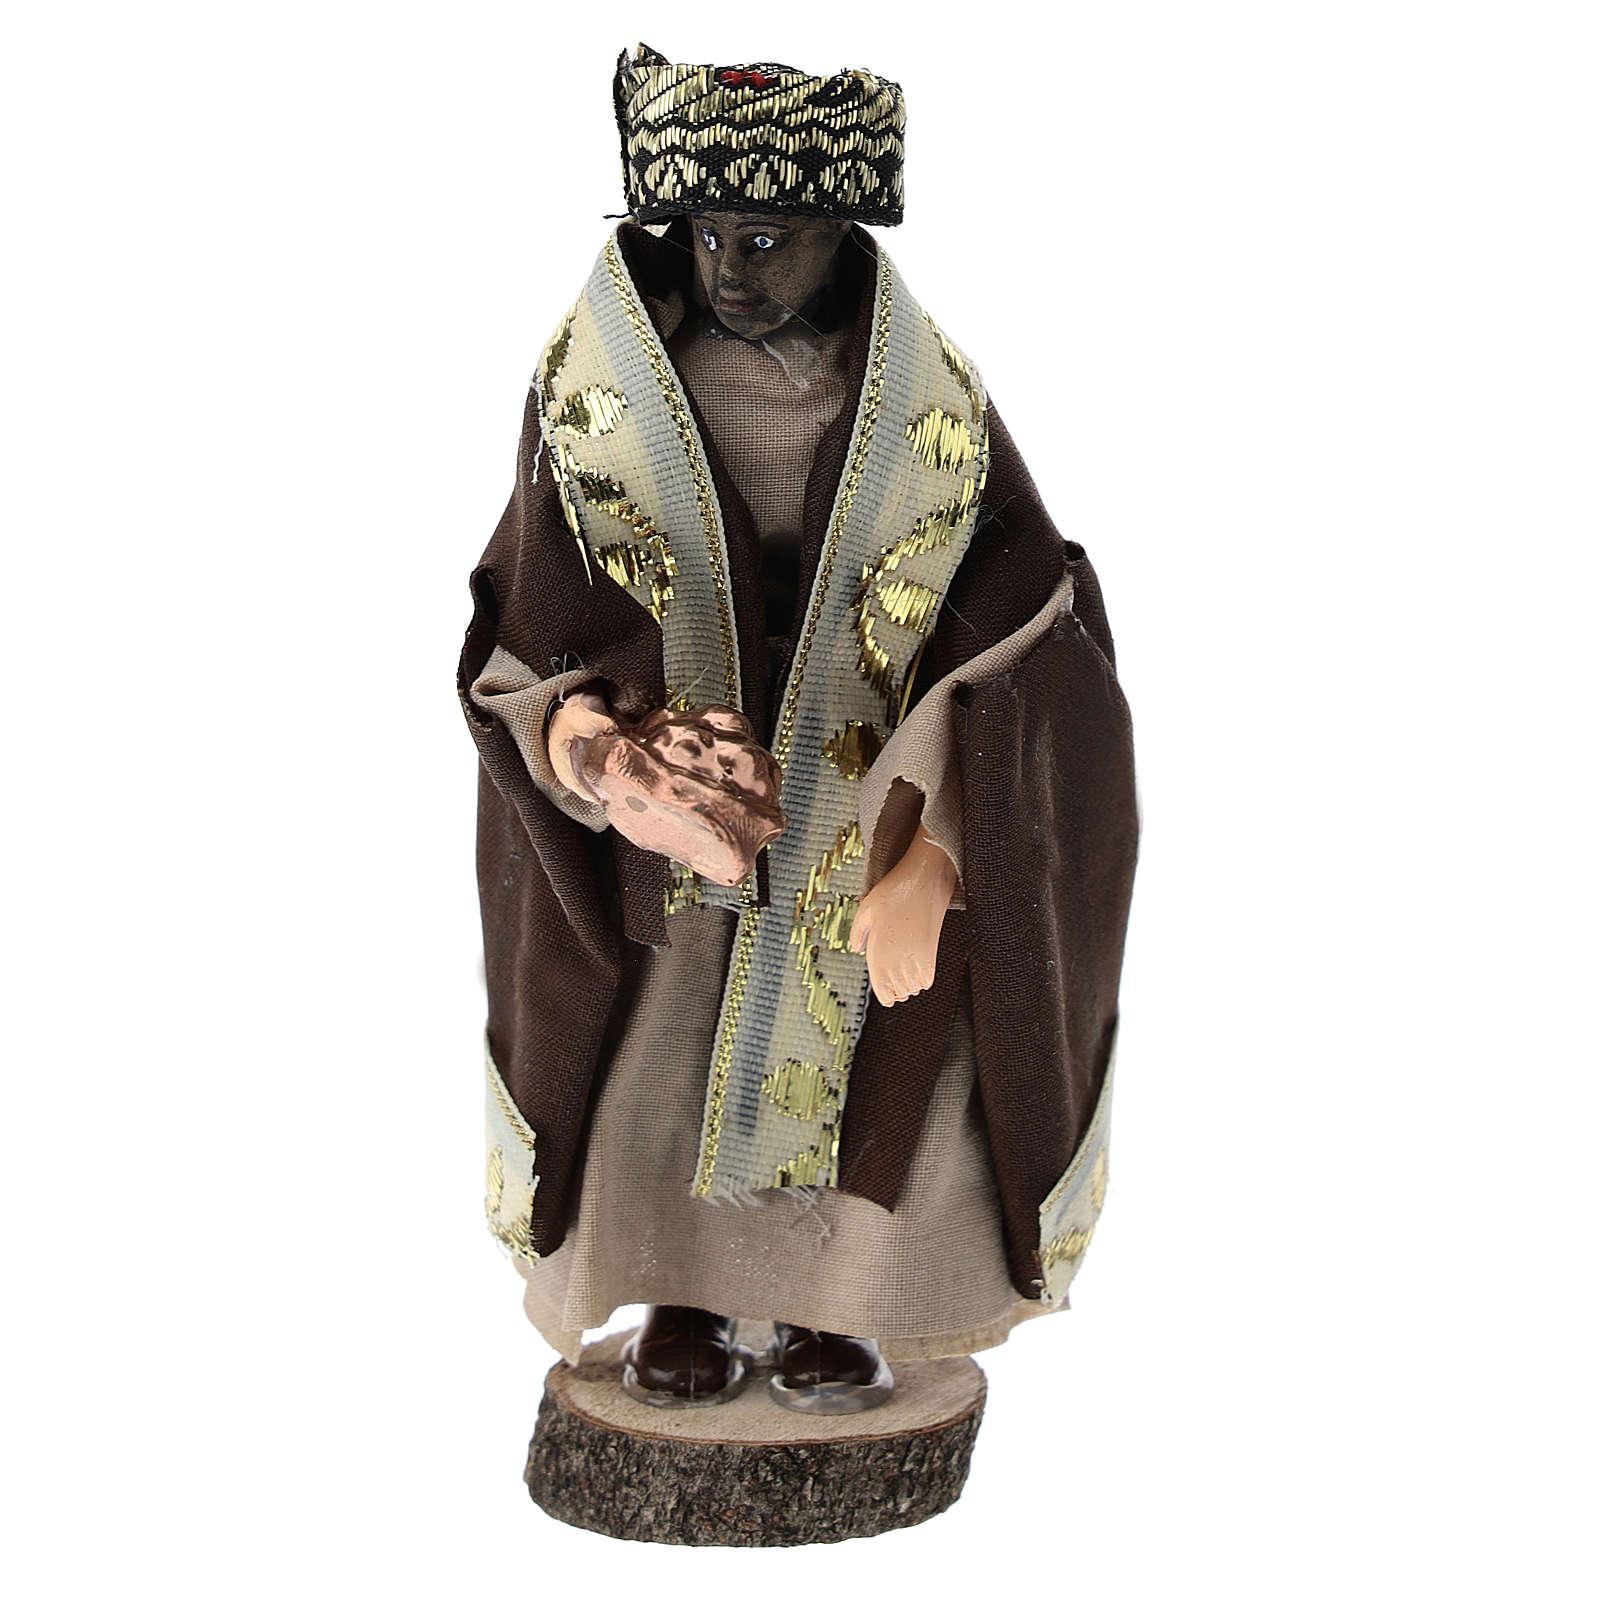 Statue of Moorish King for Nativity scenes of 12 cm in terracotta and plastic 3